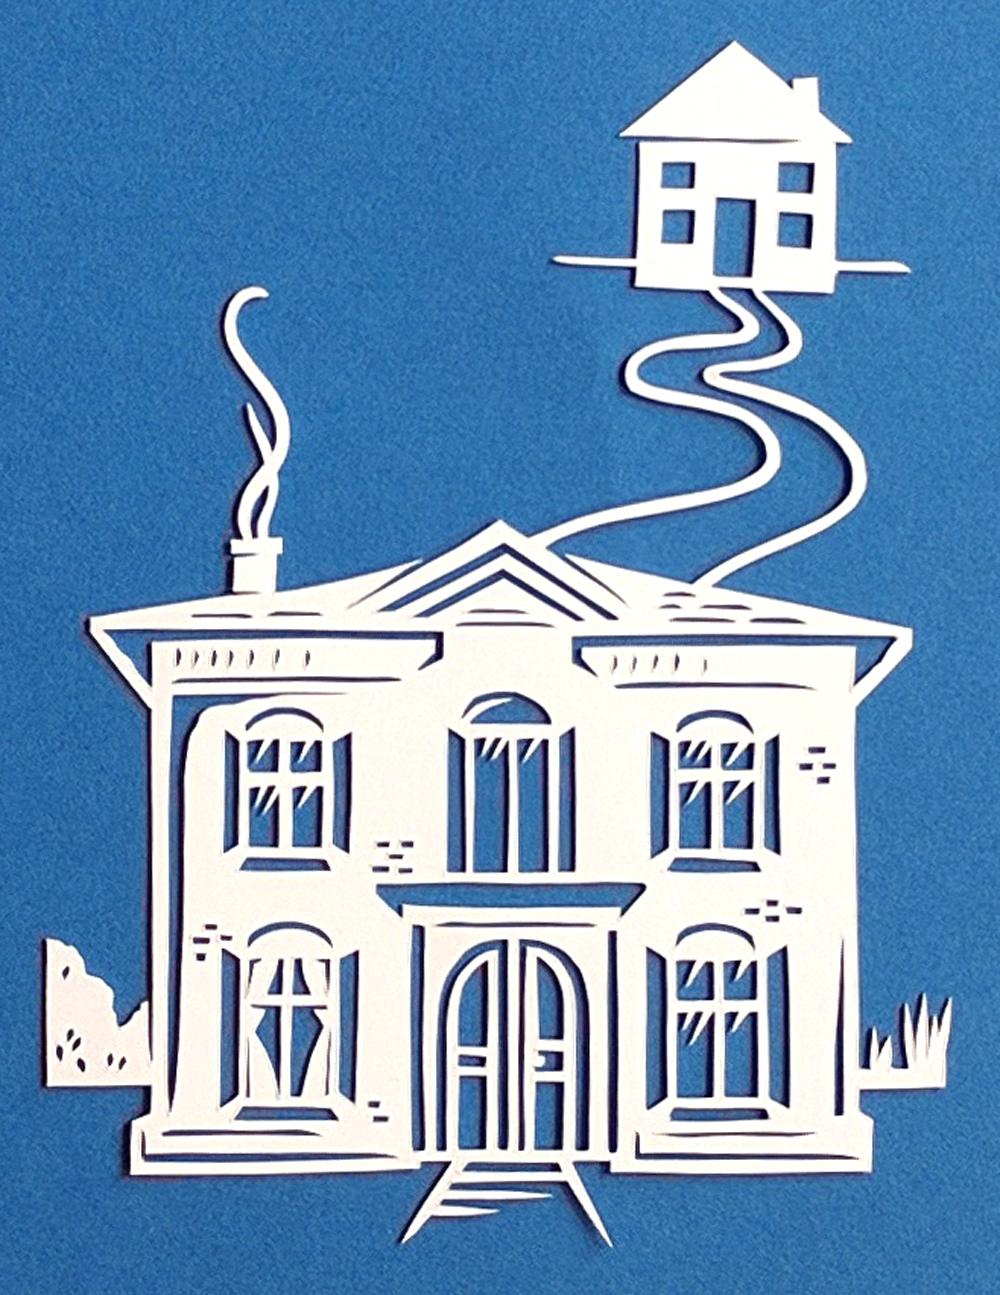 papercut-illustration-blue-house